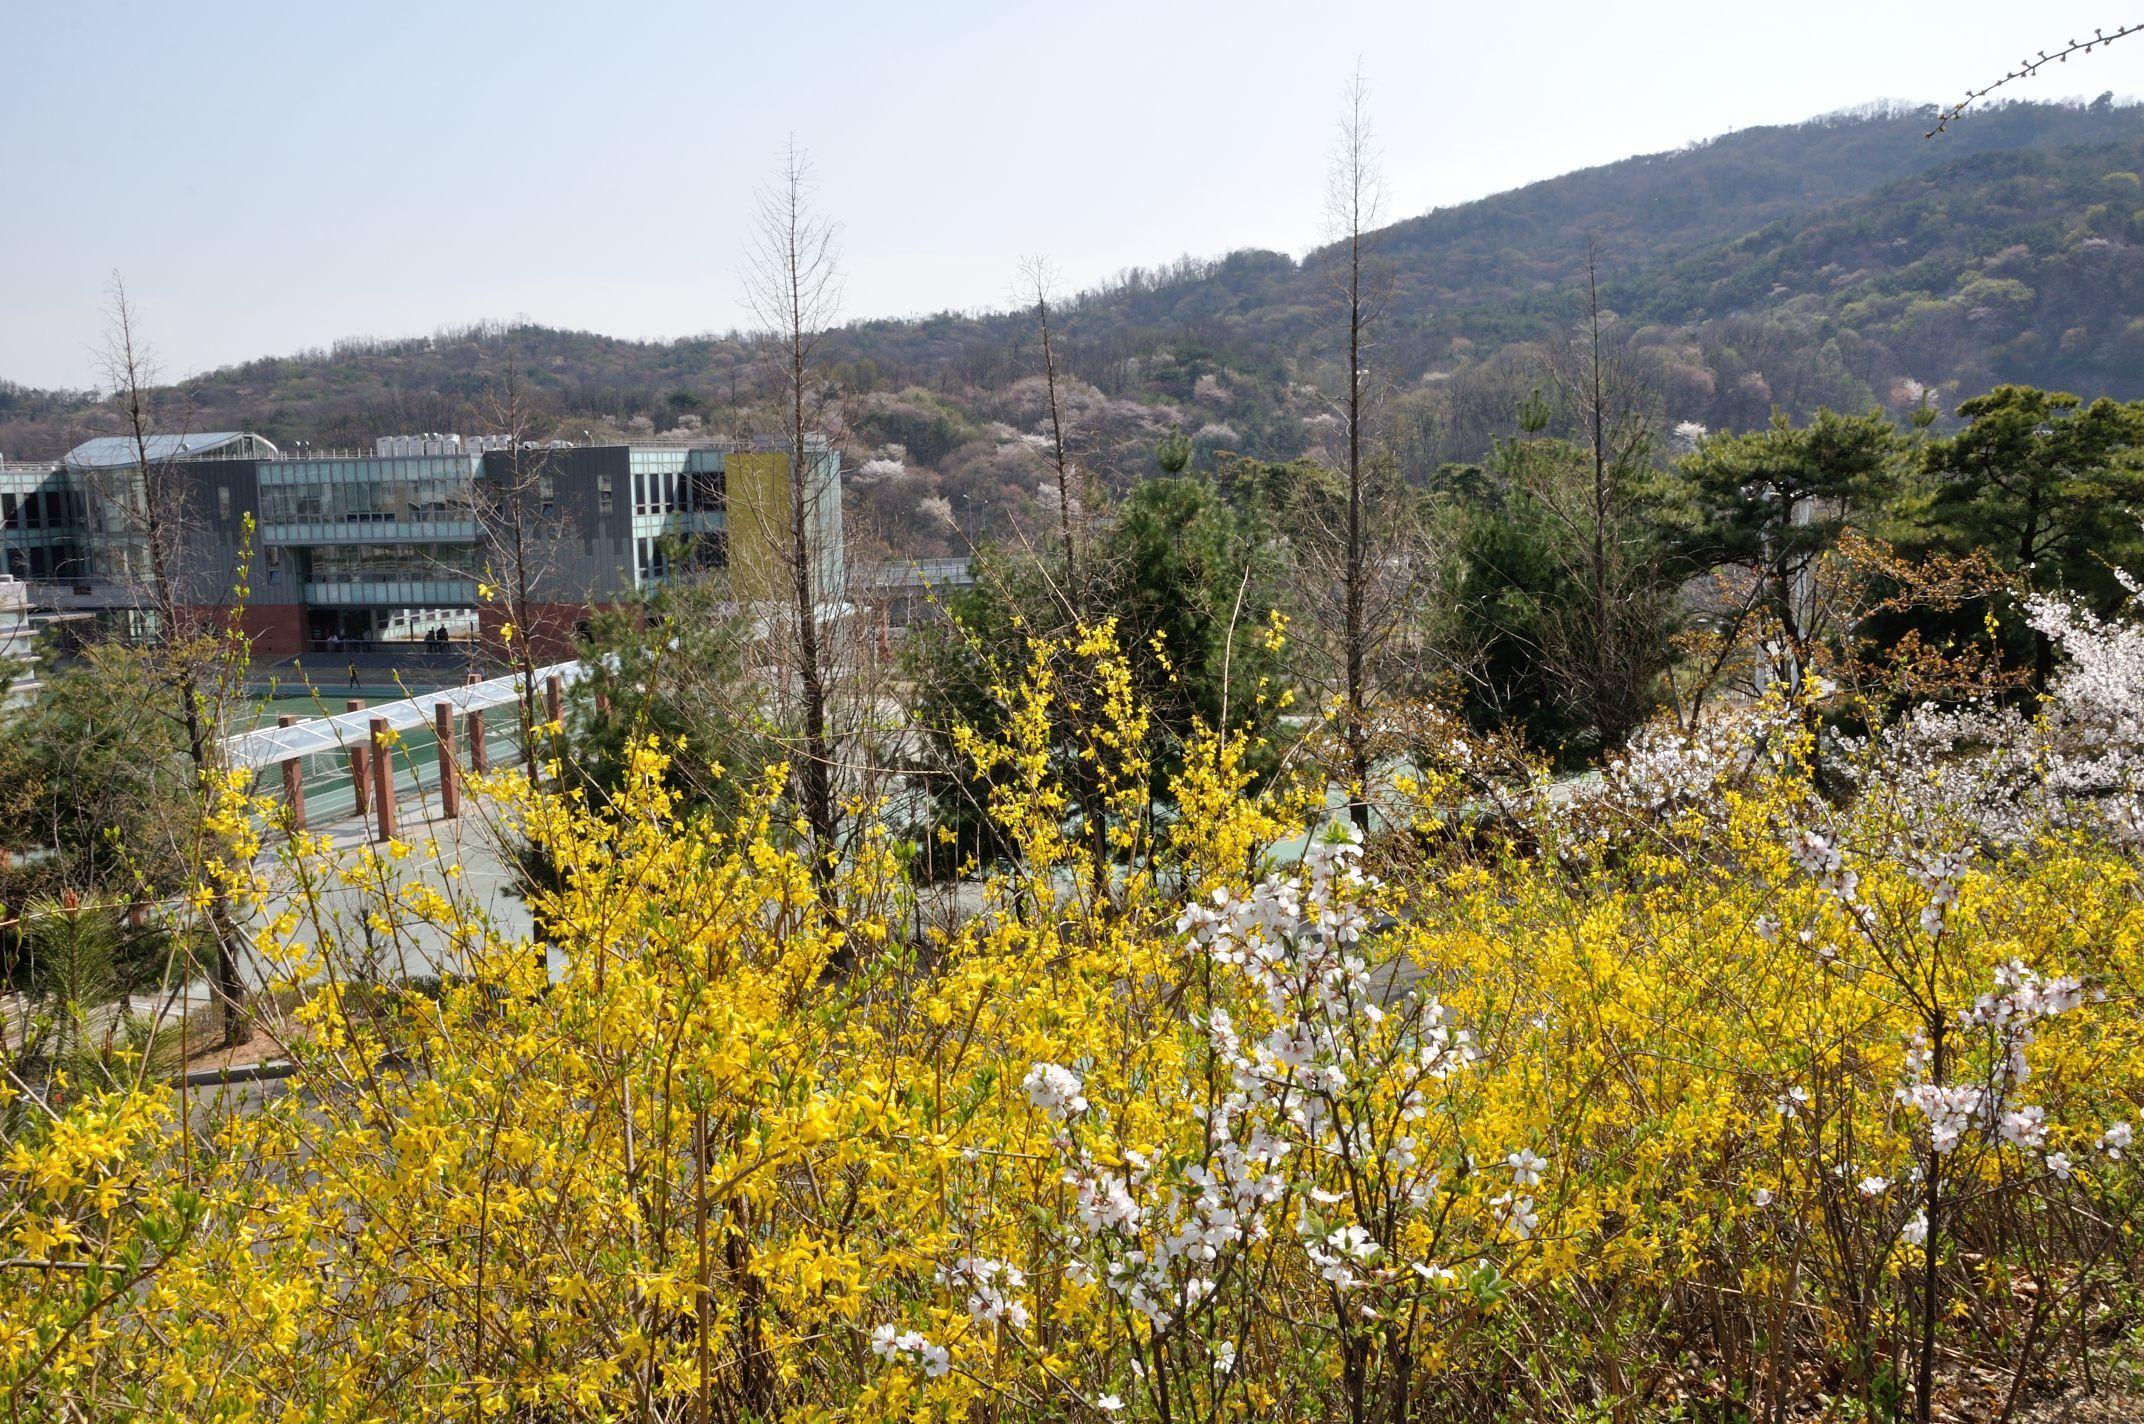 Student Union Blg and Bukaksan Mountain 정문 언덕길에서 바라본 복지관과 북악산